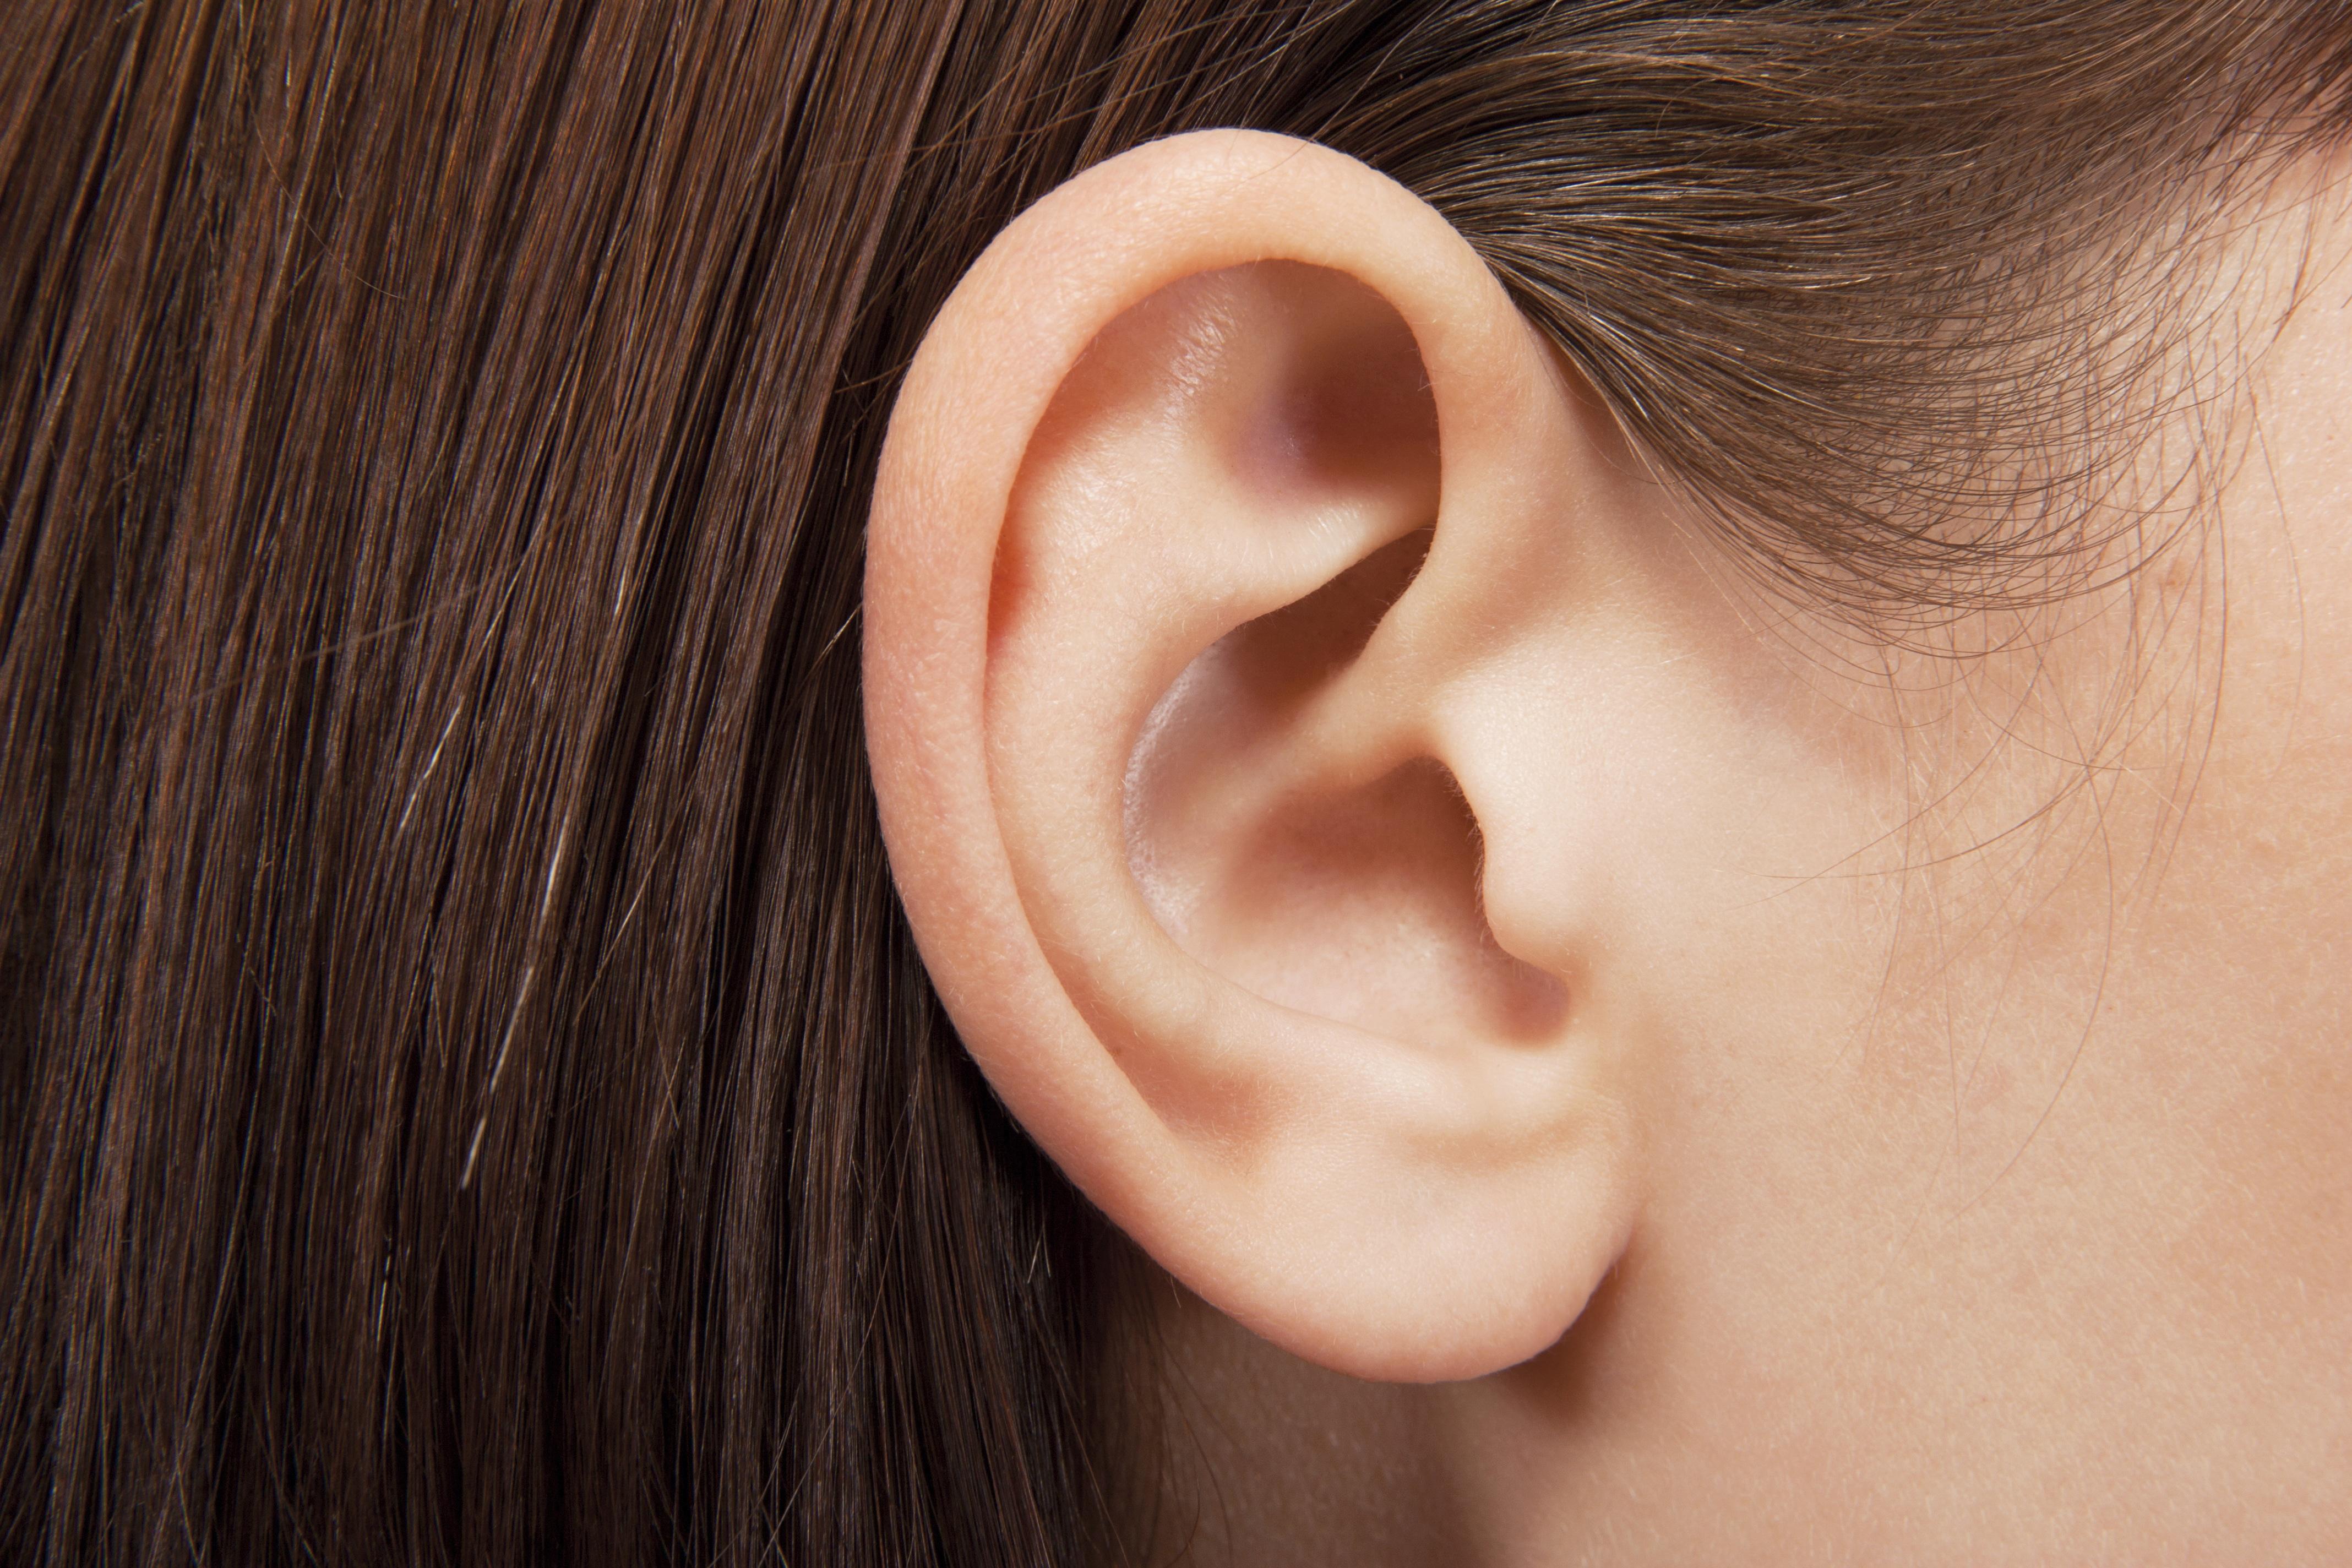 Ear of a Woman with dark hair